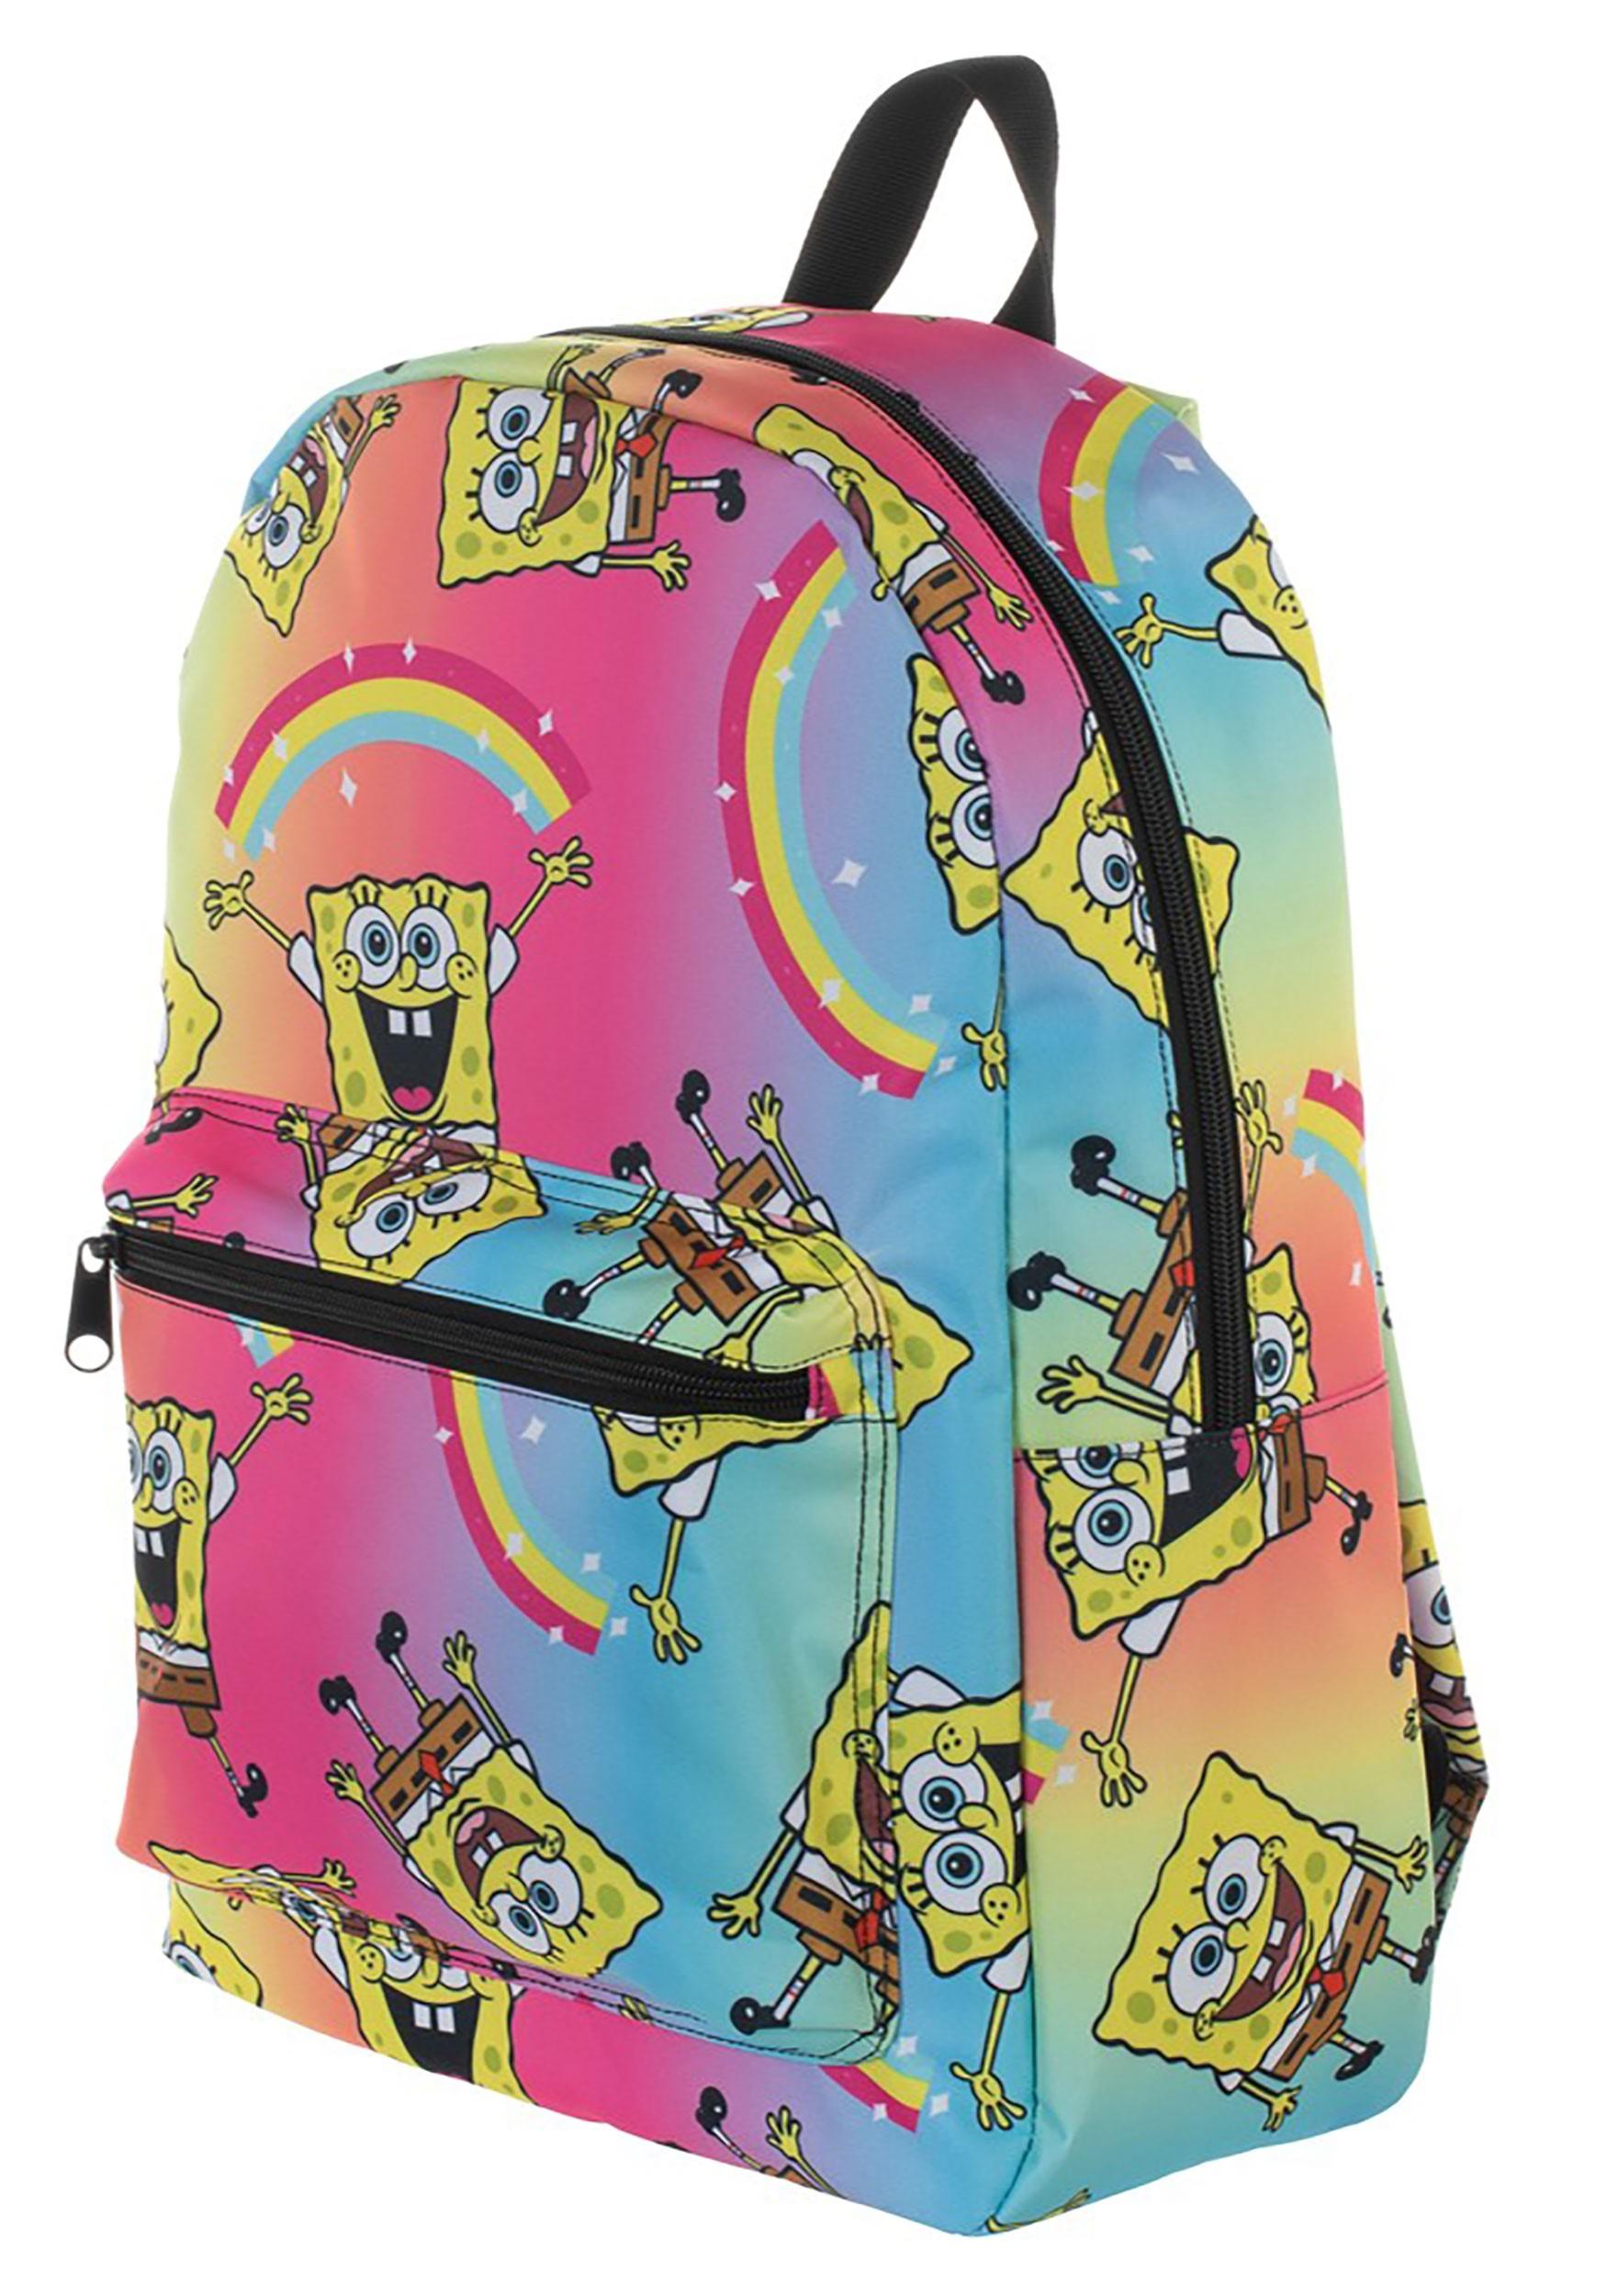 Spongebob Squarepants Spongebob All Over Backpack